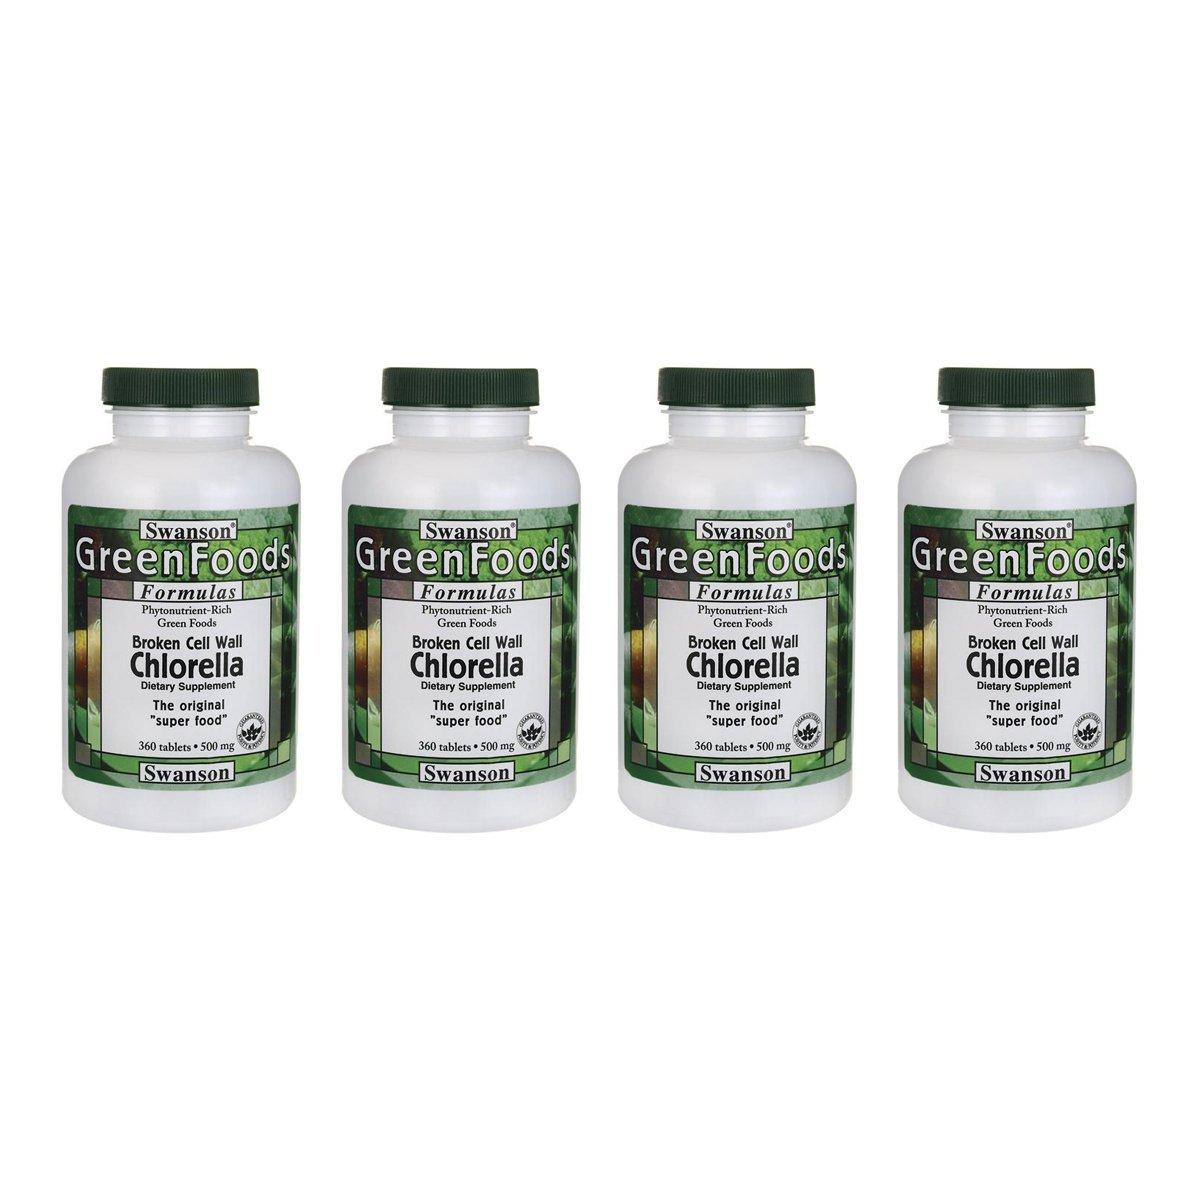 Swanson Broken Cell Wall Chlorella 500 mg 360 Tabs 4 Pack